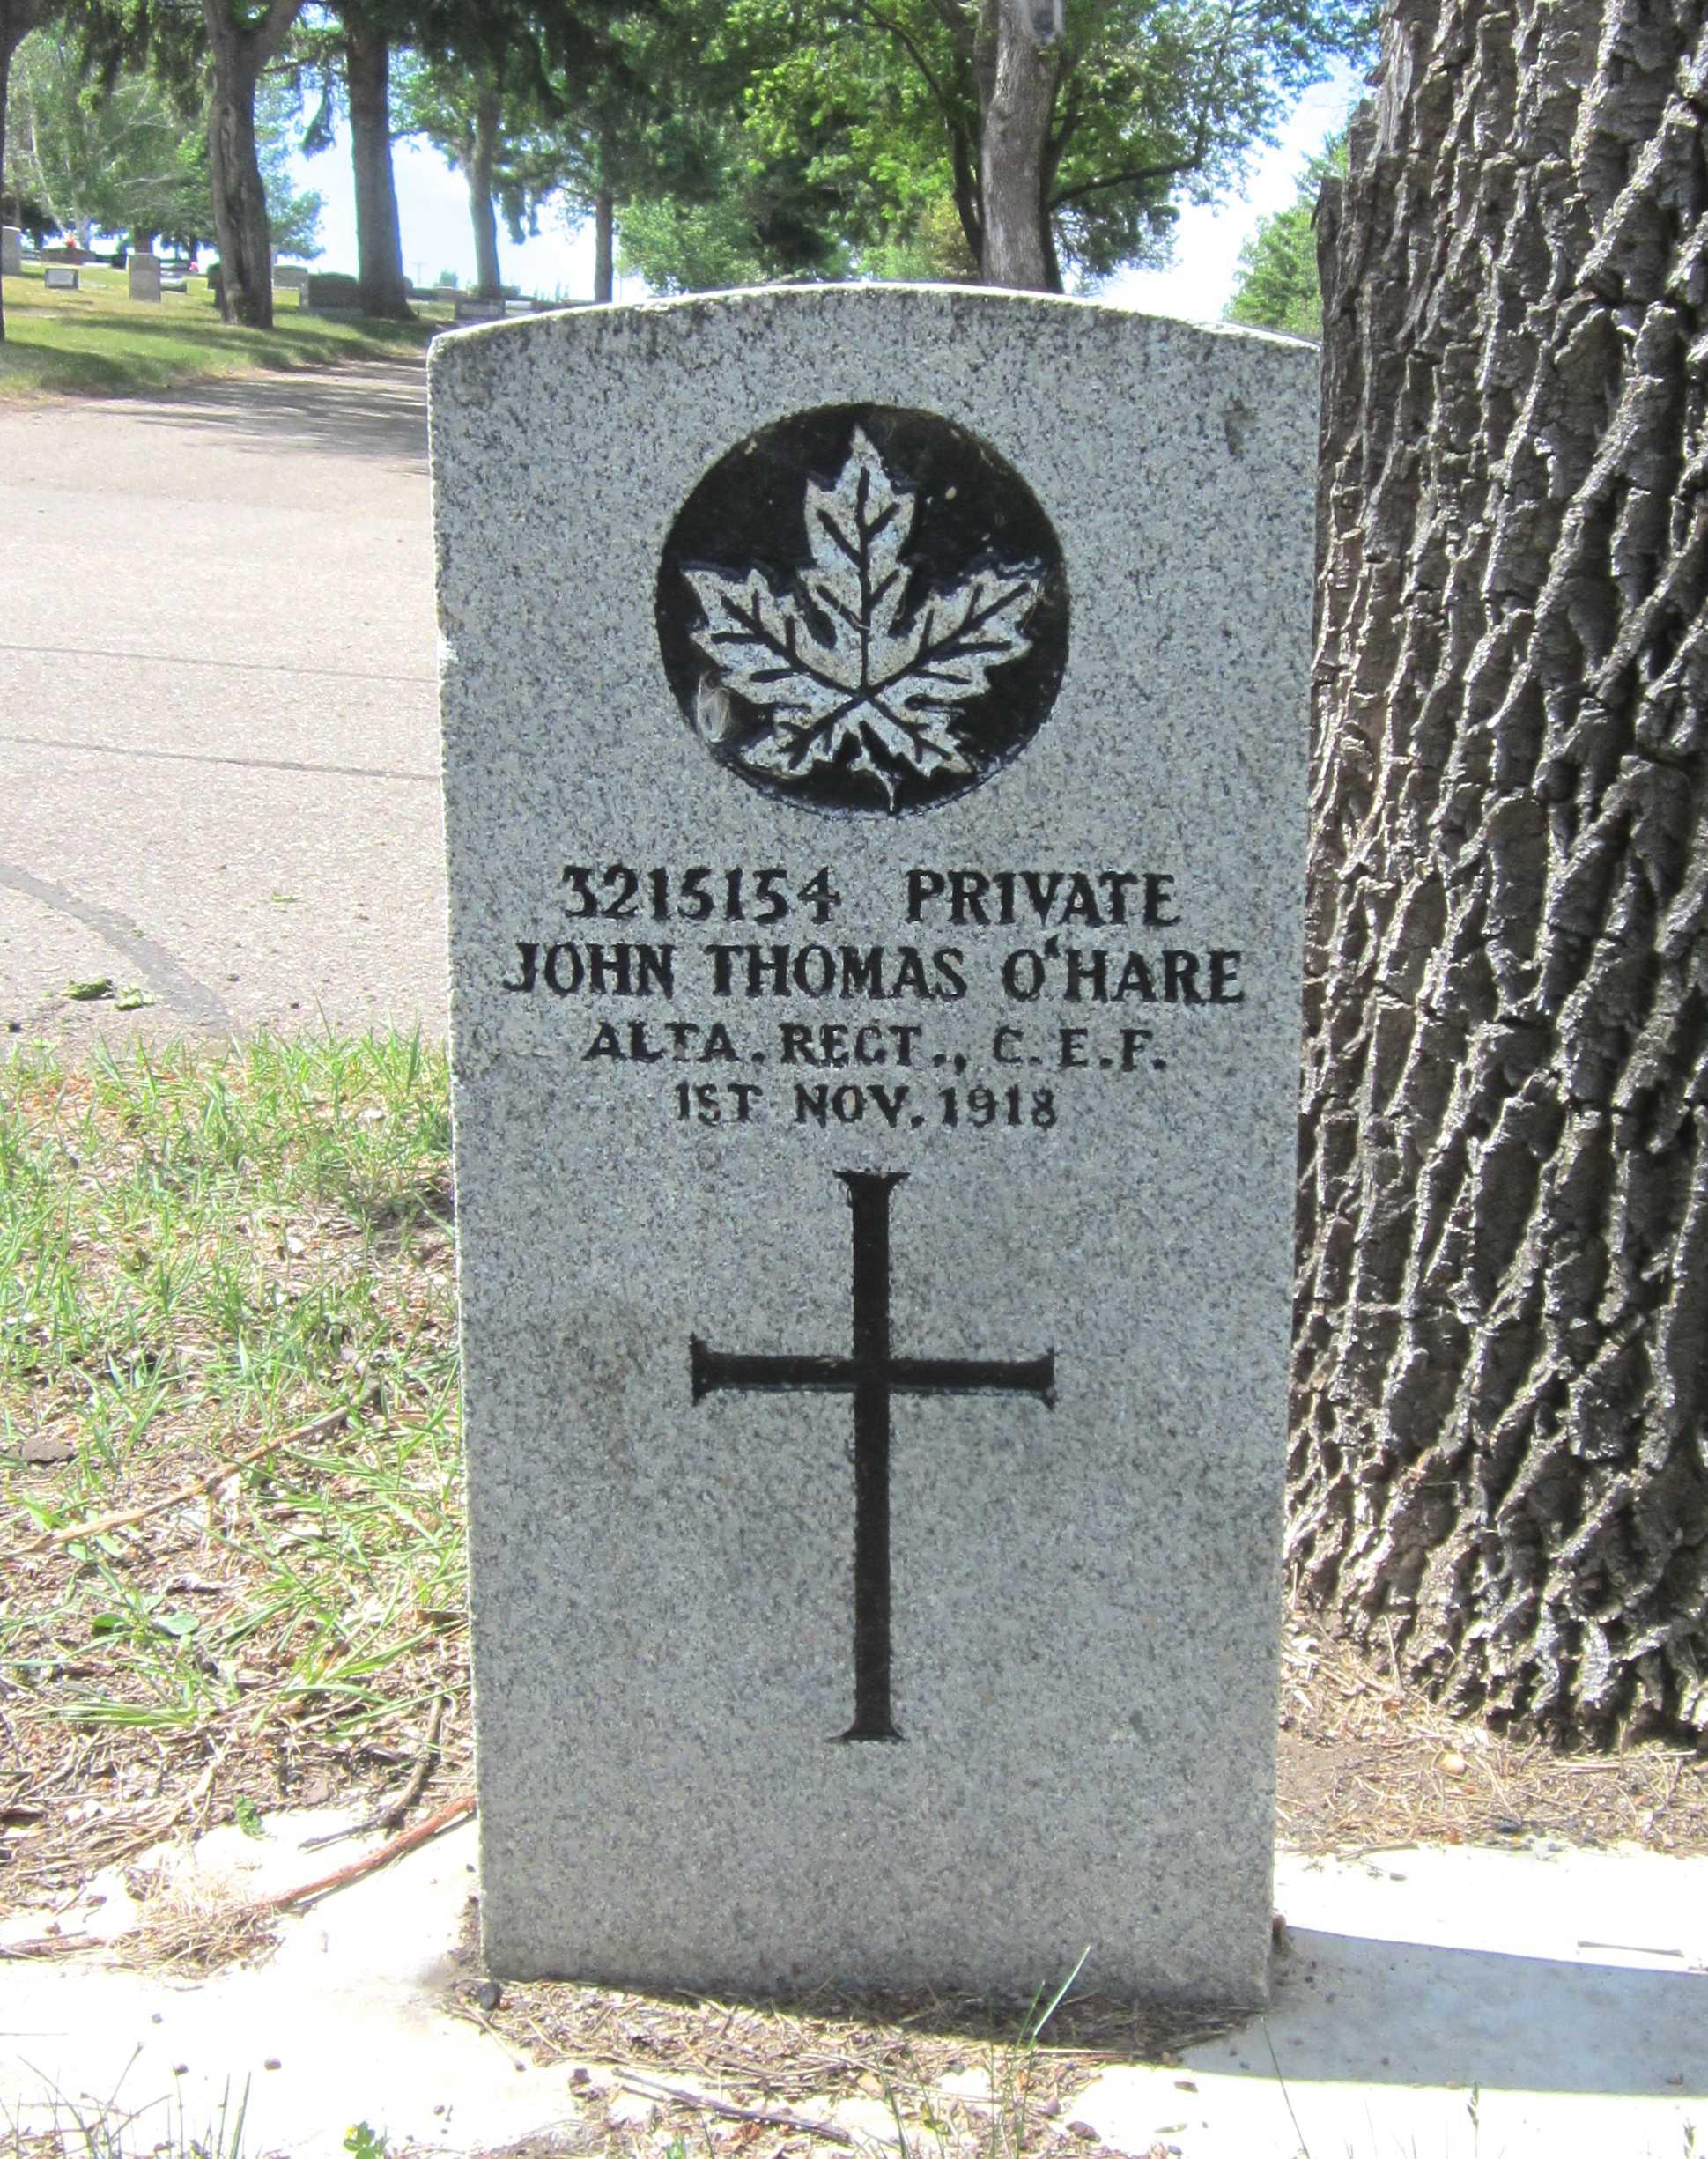 Grave marker– [Maple Leaf] 3215154 PRIVATE JOHN THOMAS O'HARE ALTA. REGT., C.E.F. 1ST NOV. 1918 [Cross]